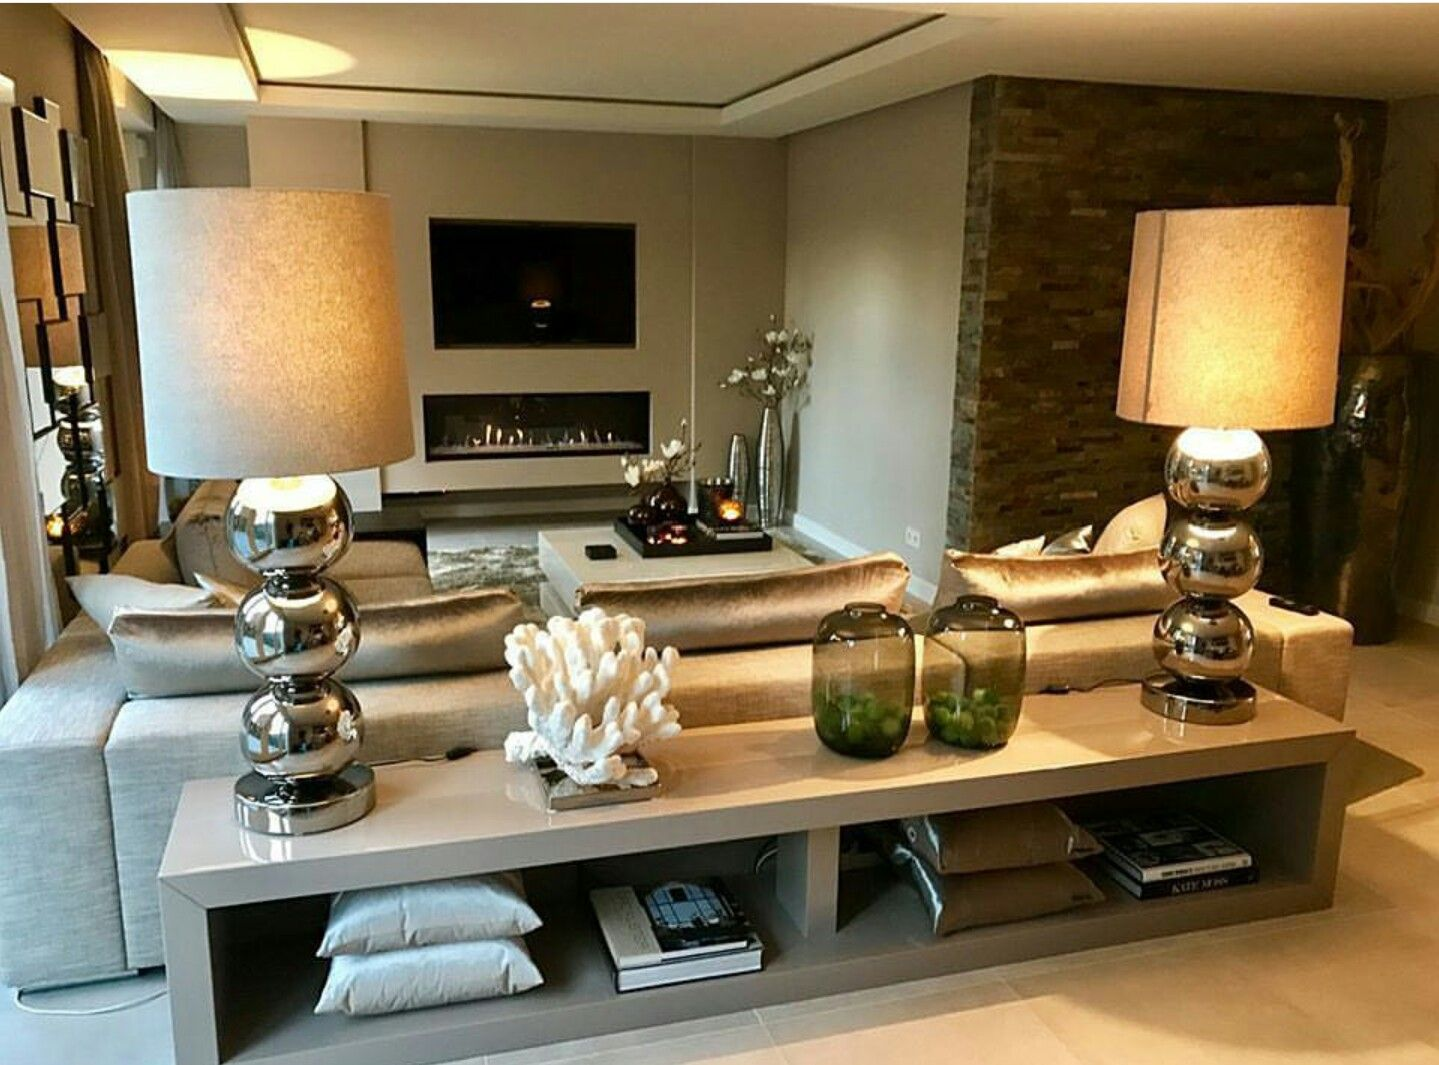 Mobili rampazzo ~ Koltuk arkasi dresuar for the home pinterest living rooms